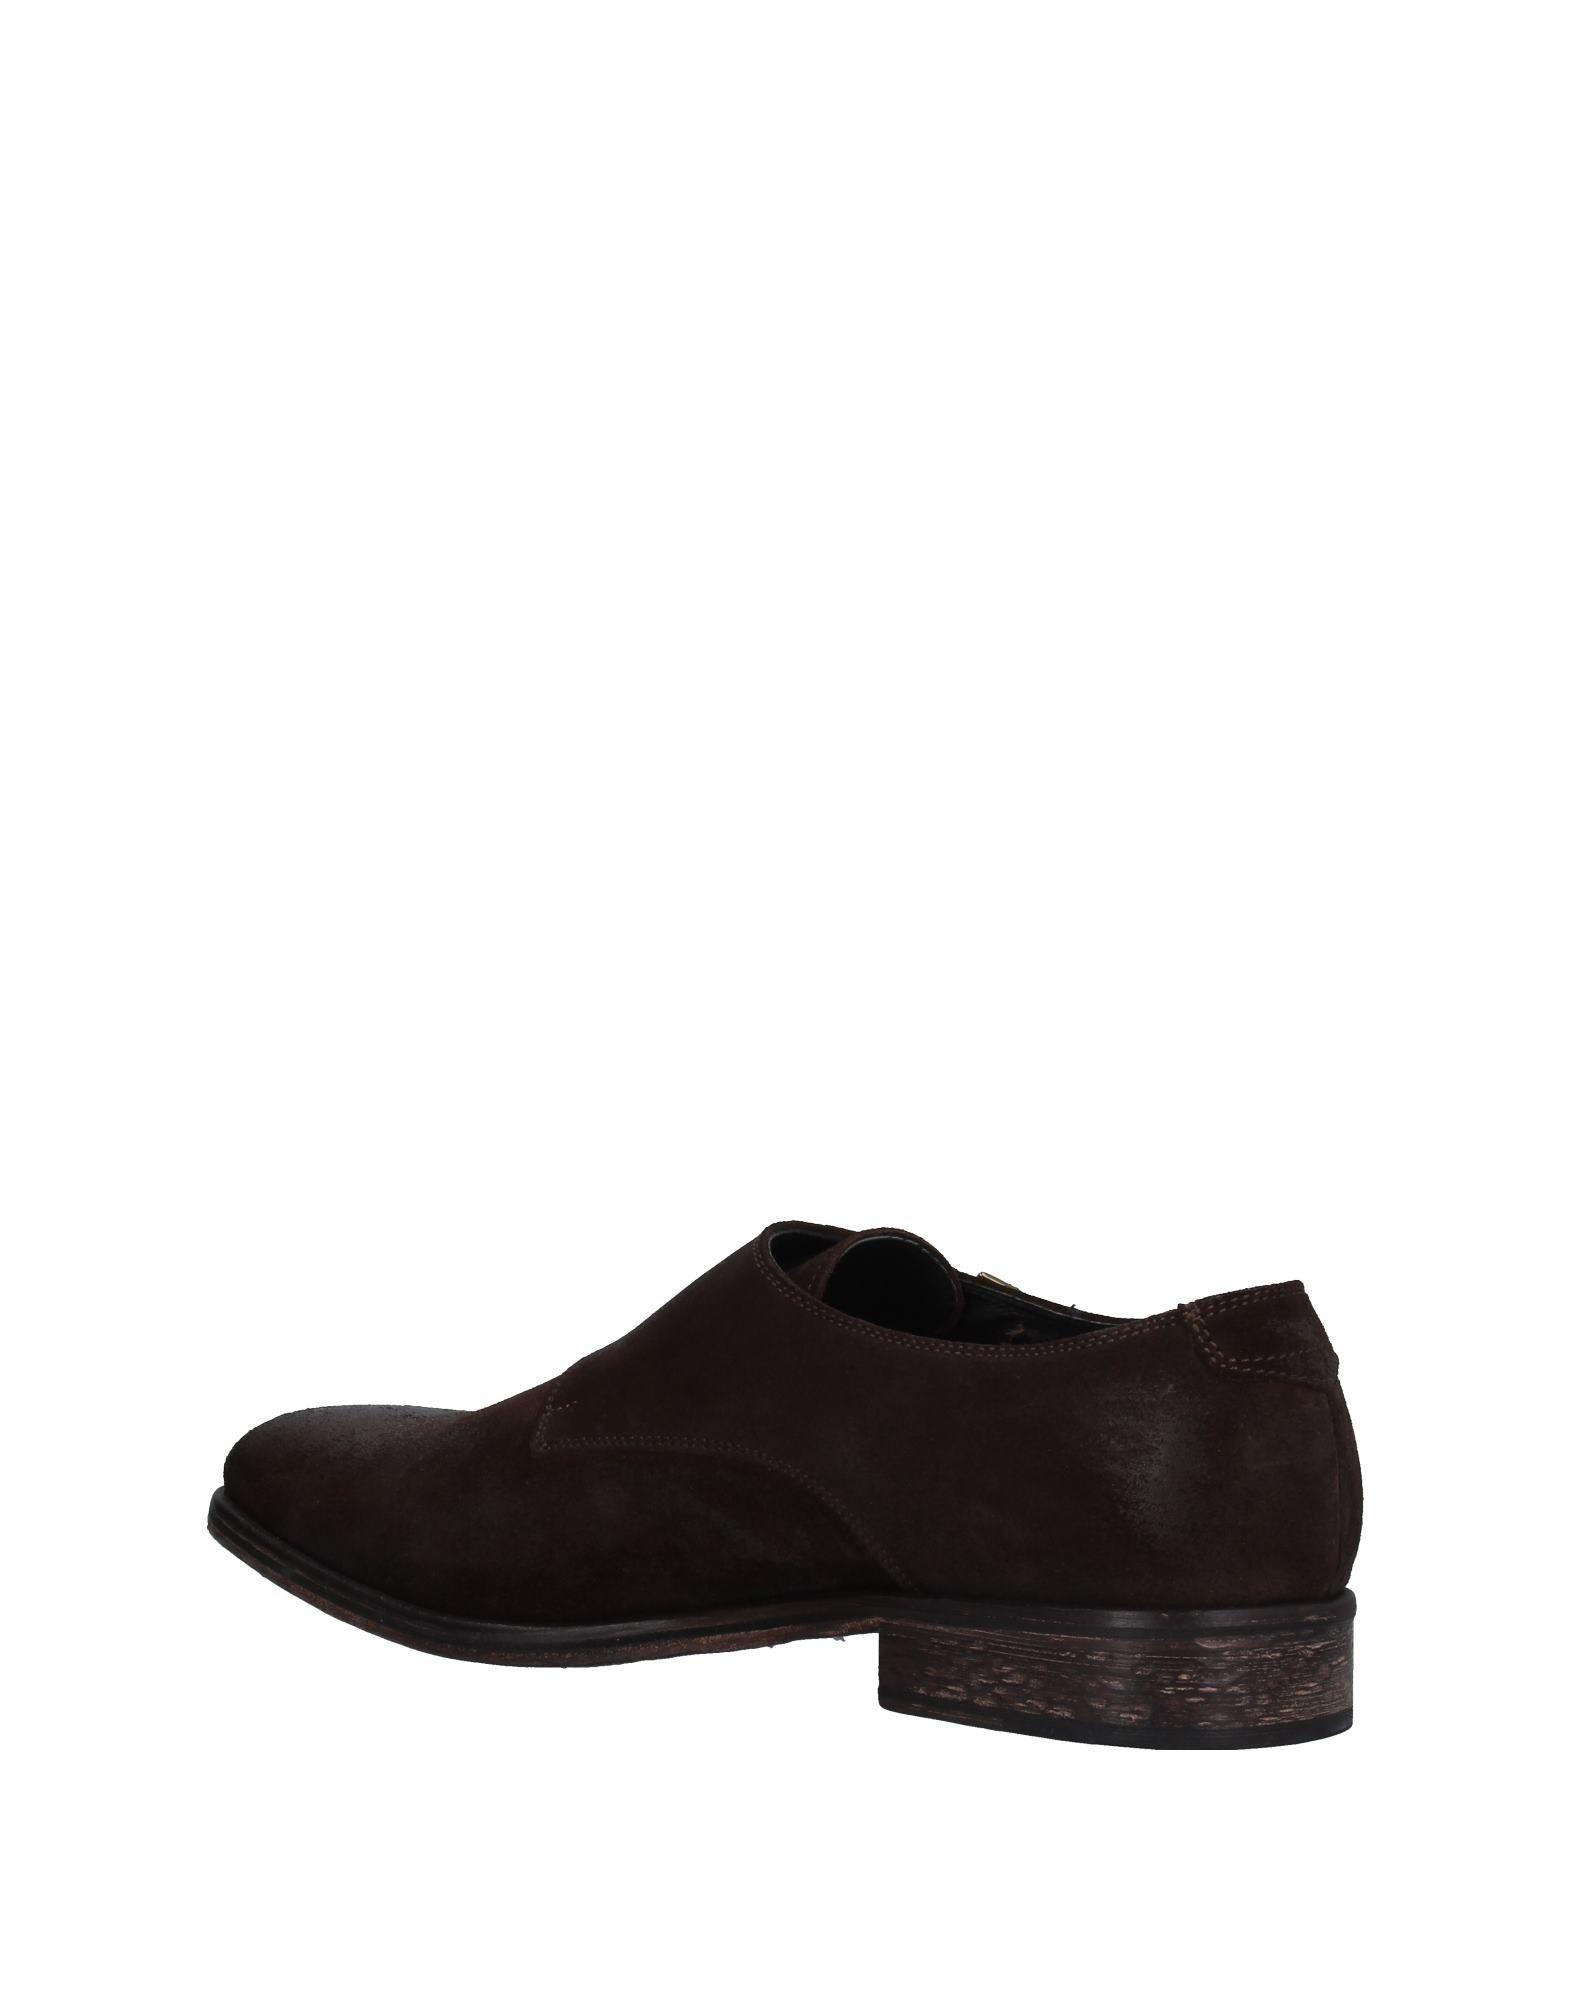 Daniele Alessandrini Mokassins Herren  Schuhe 11271474MO Gute Qualität beliebte Schuhe  d0801b